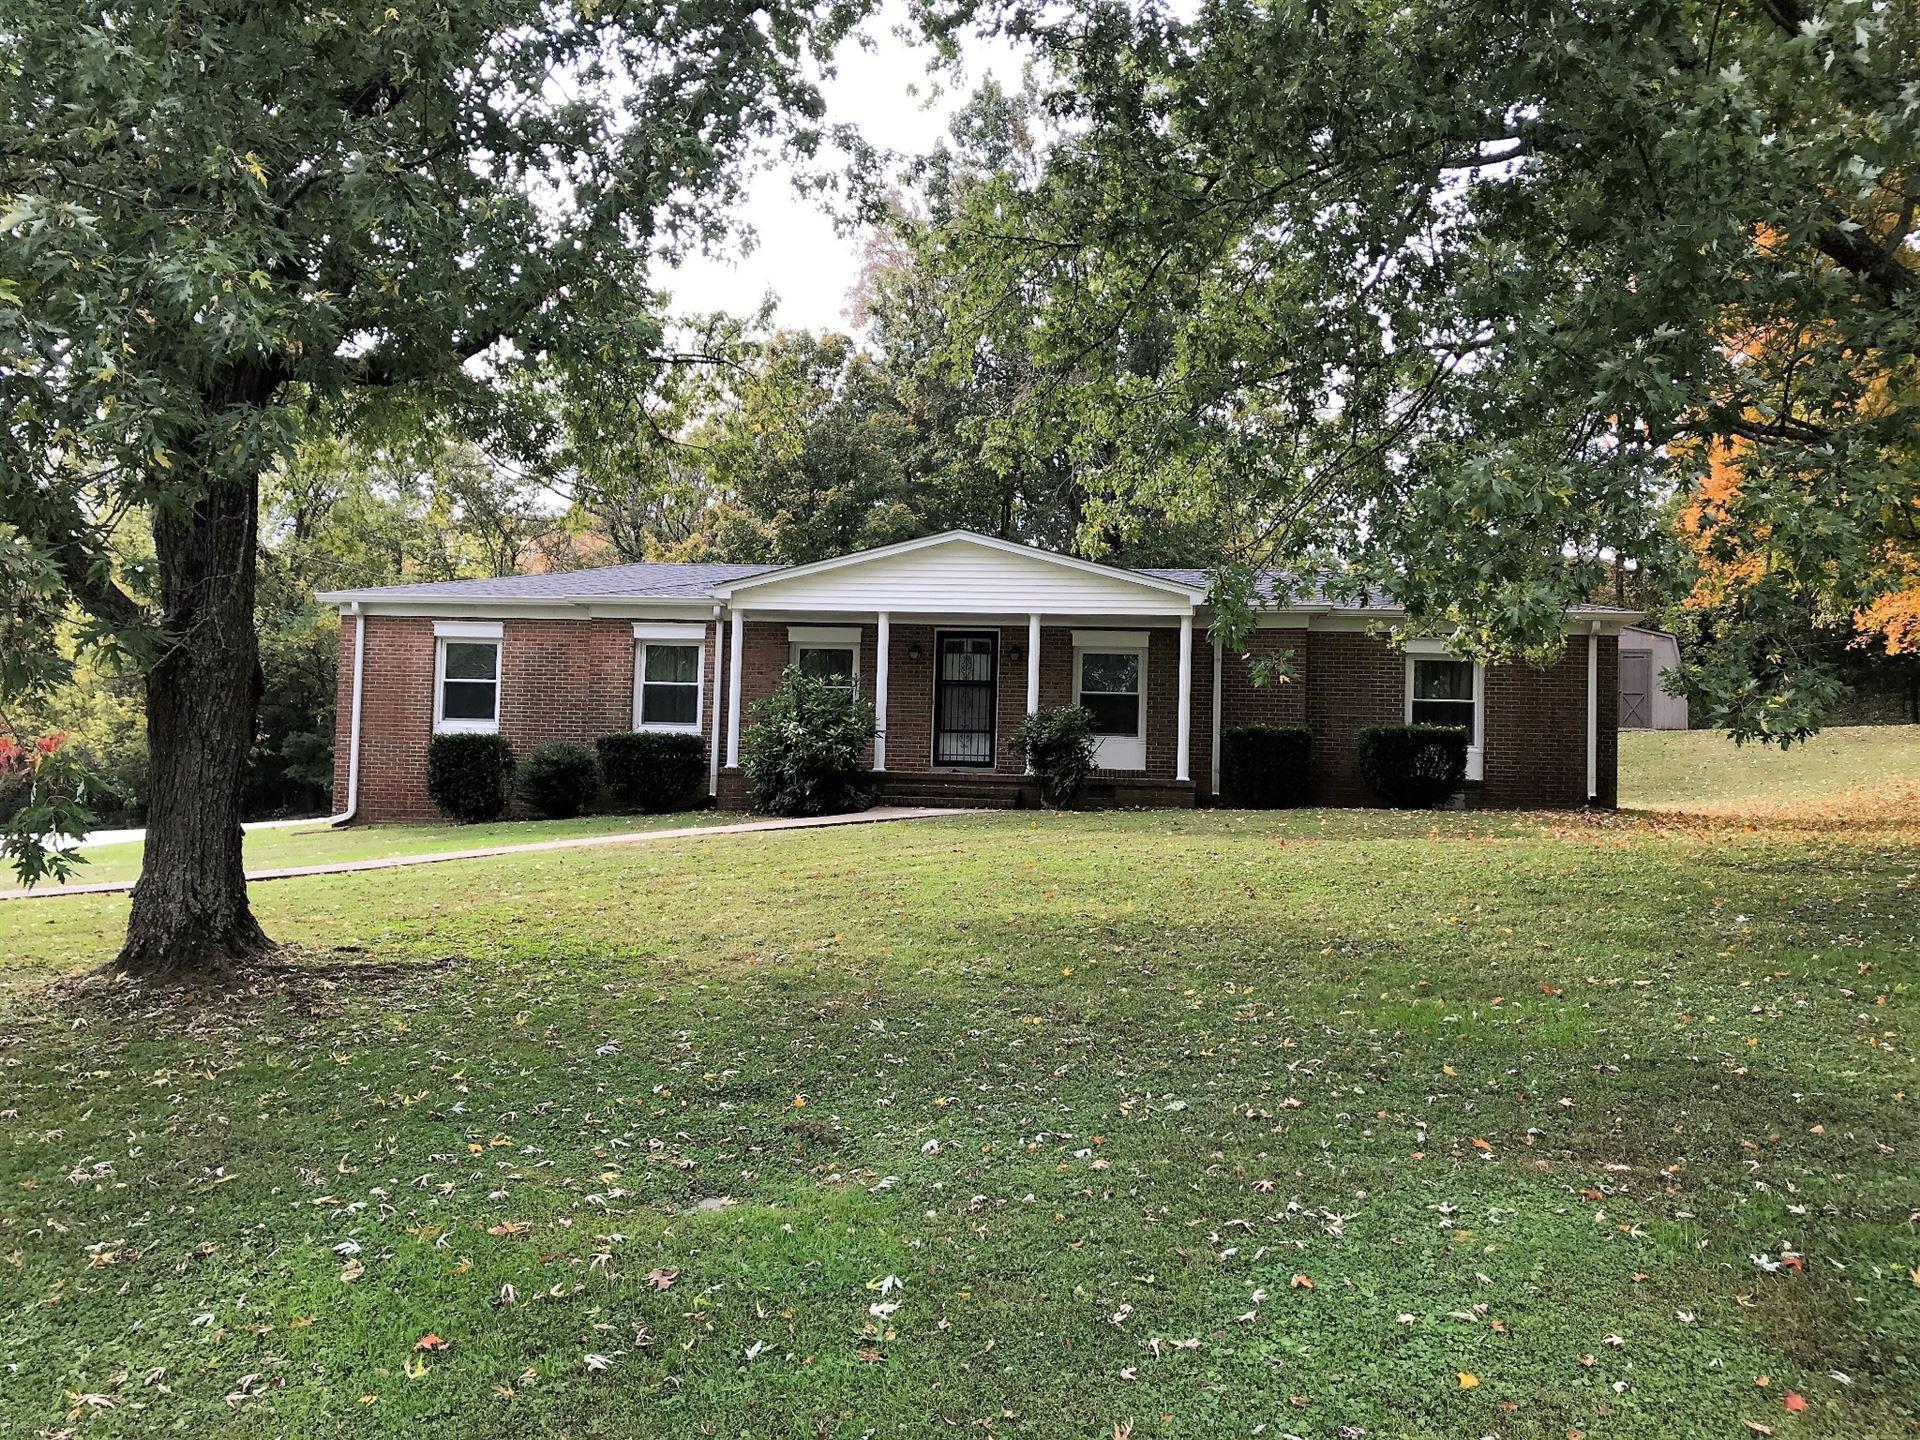 475 Manor Cir, Lewisburg, TN 37091 - MLS#: 2199780